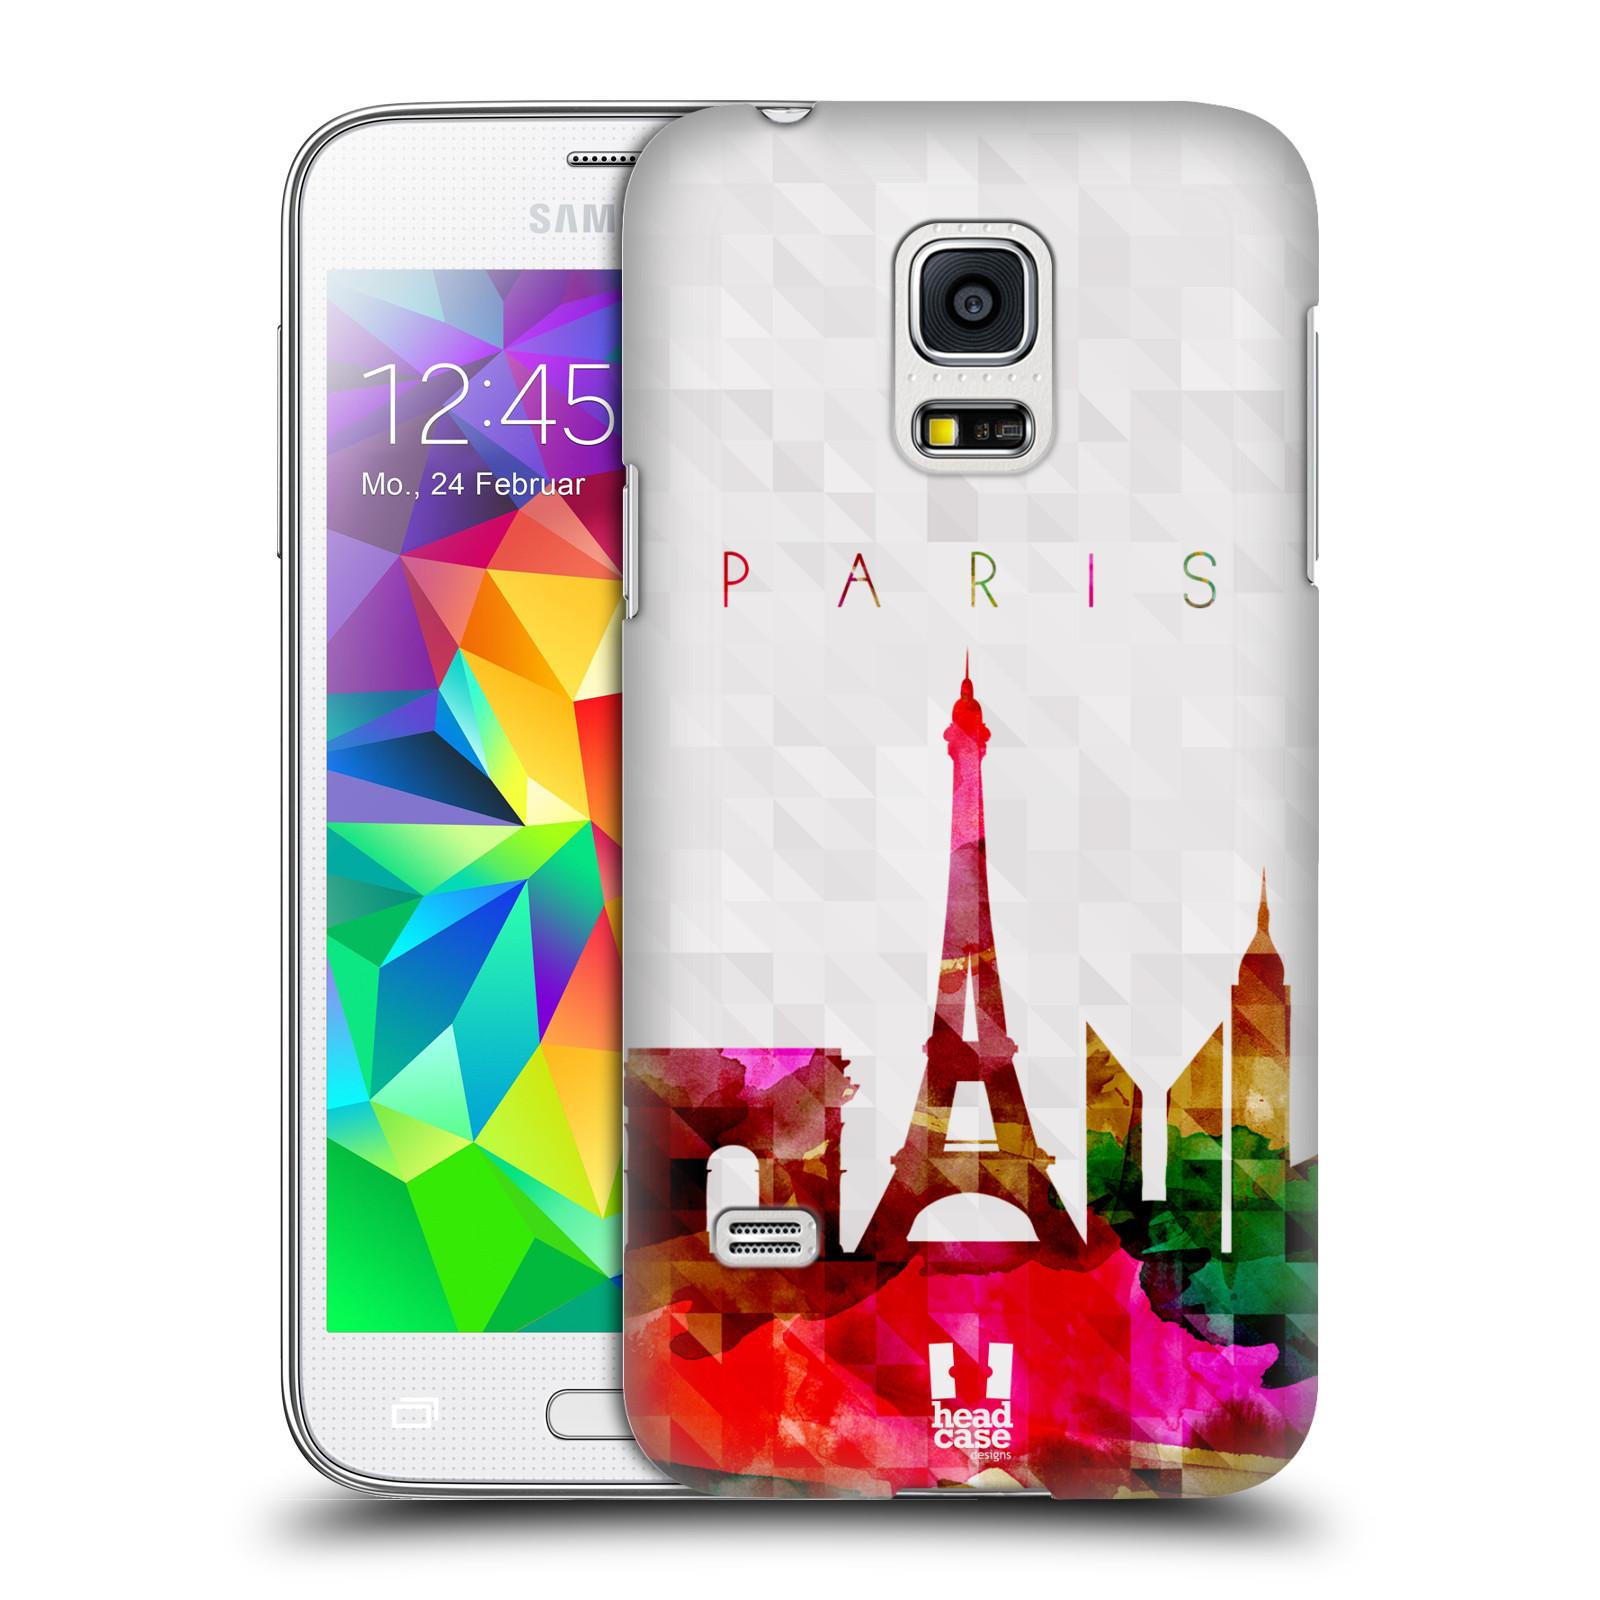 HEAD CASE plastový obal na mobil SAMSUNG Galaxy S5 MINI / S5 MINI DUOS vzor Vodní barva města silueta PAŘÍŽ FRANICE EIFFELOVA VĚŽ